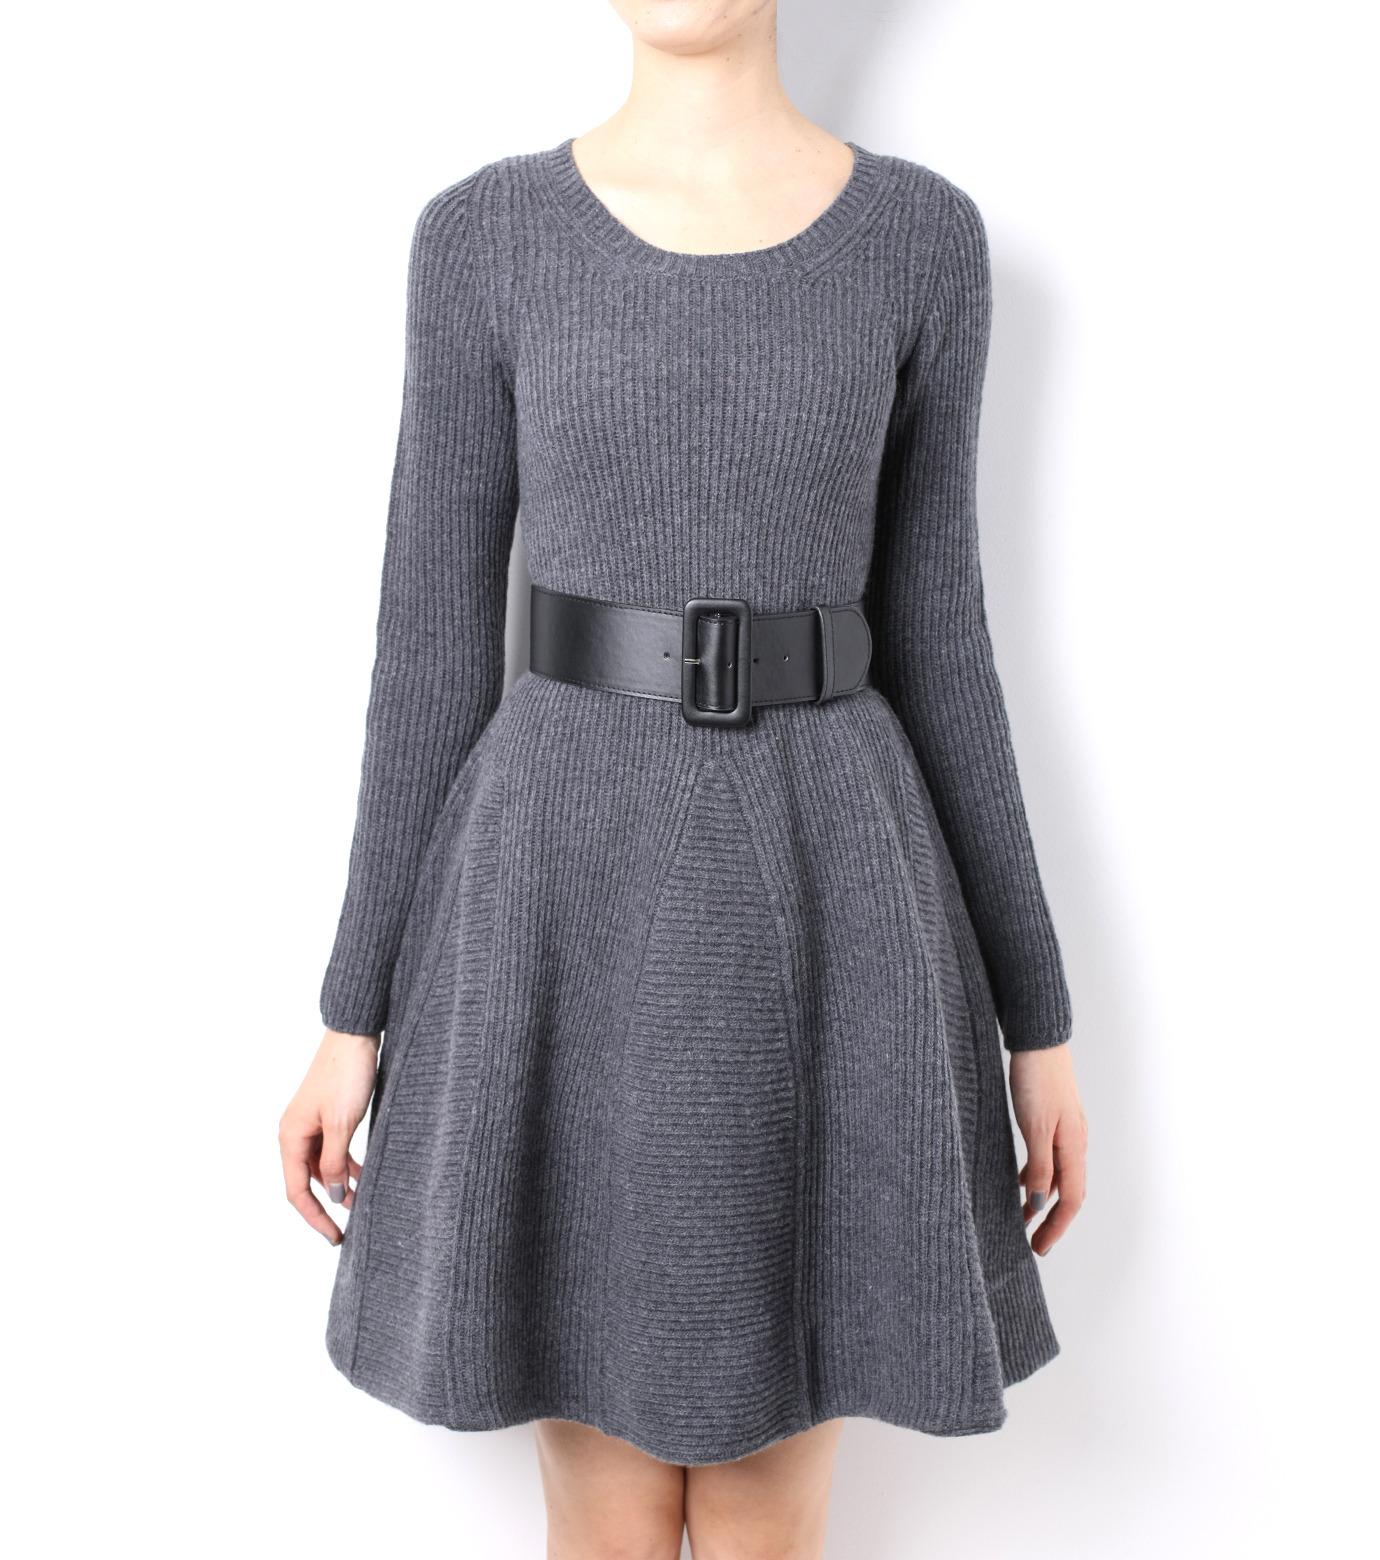 LE CIEL BLEU(ルシェルブルー)のRib Stitch Flare Crewneck Dress-GRAY-15A65025 拡大詳細画像2